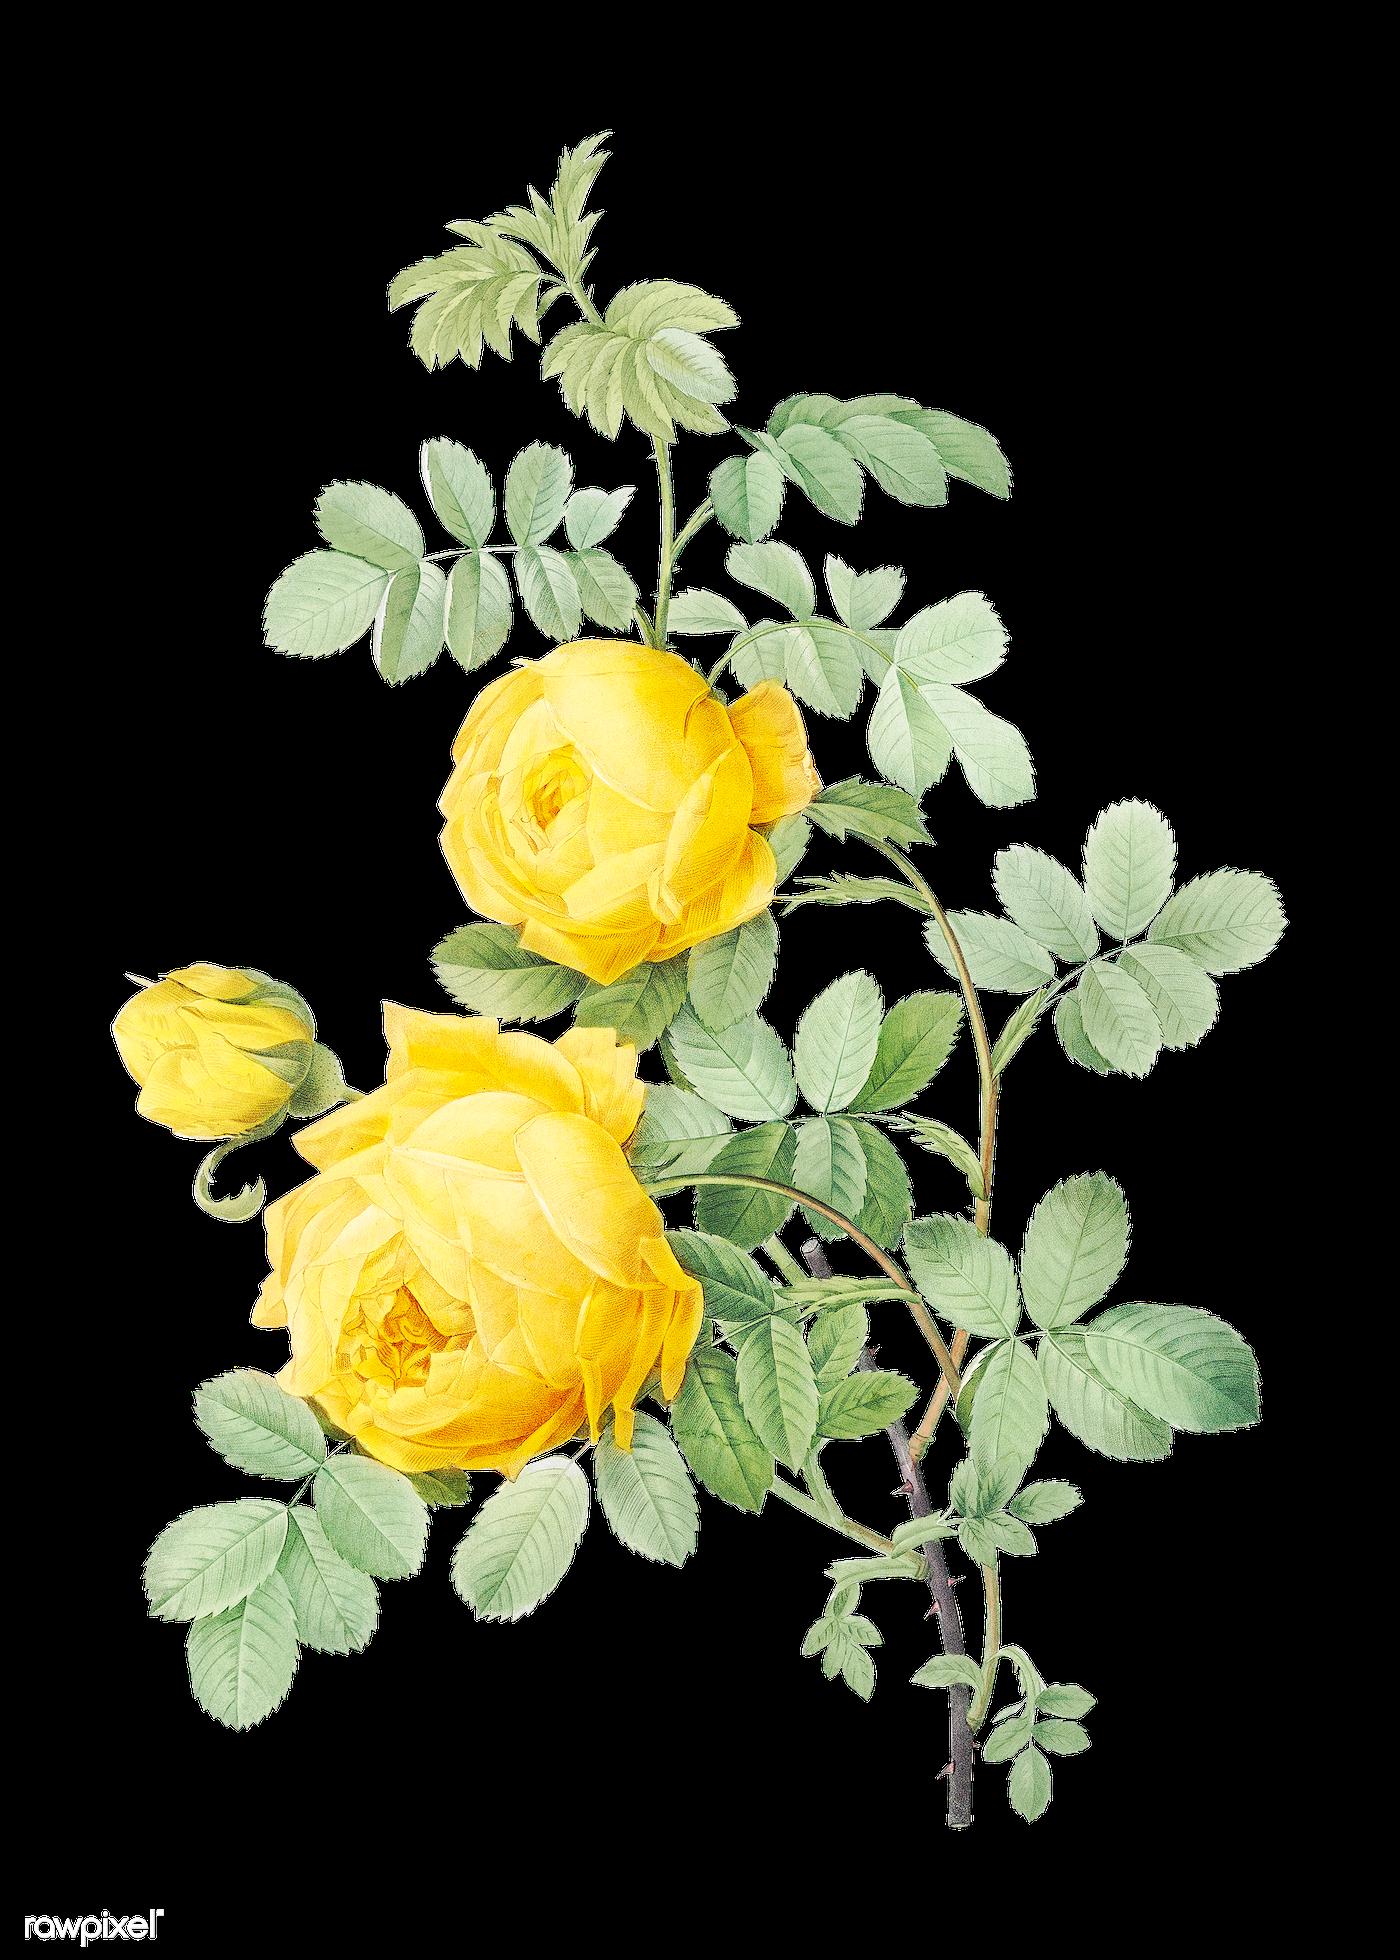 Vintage Sulphur rose drawing | Free transparent png - 574515